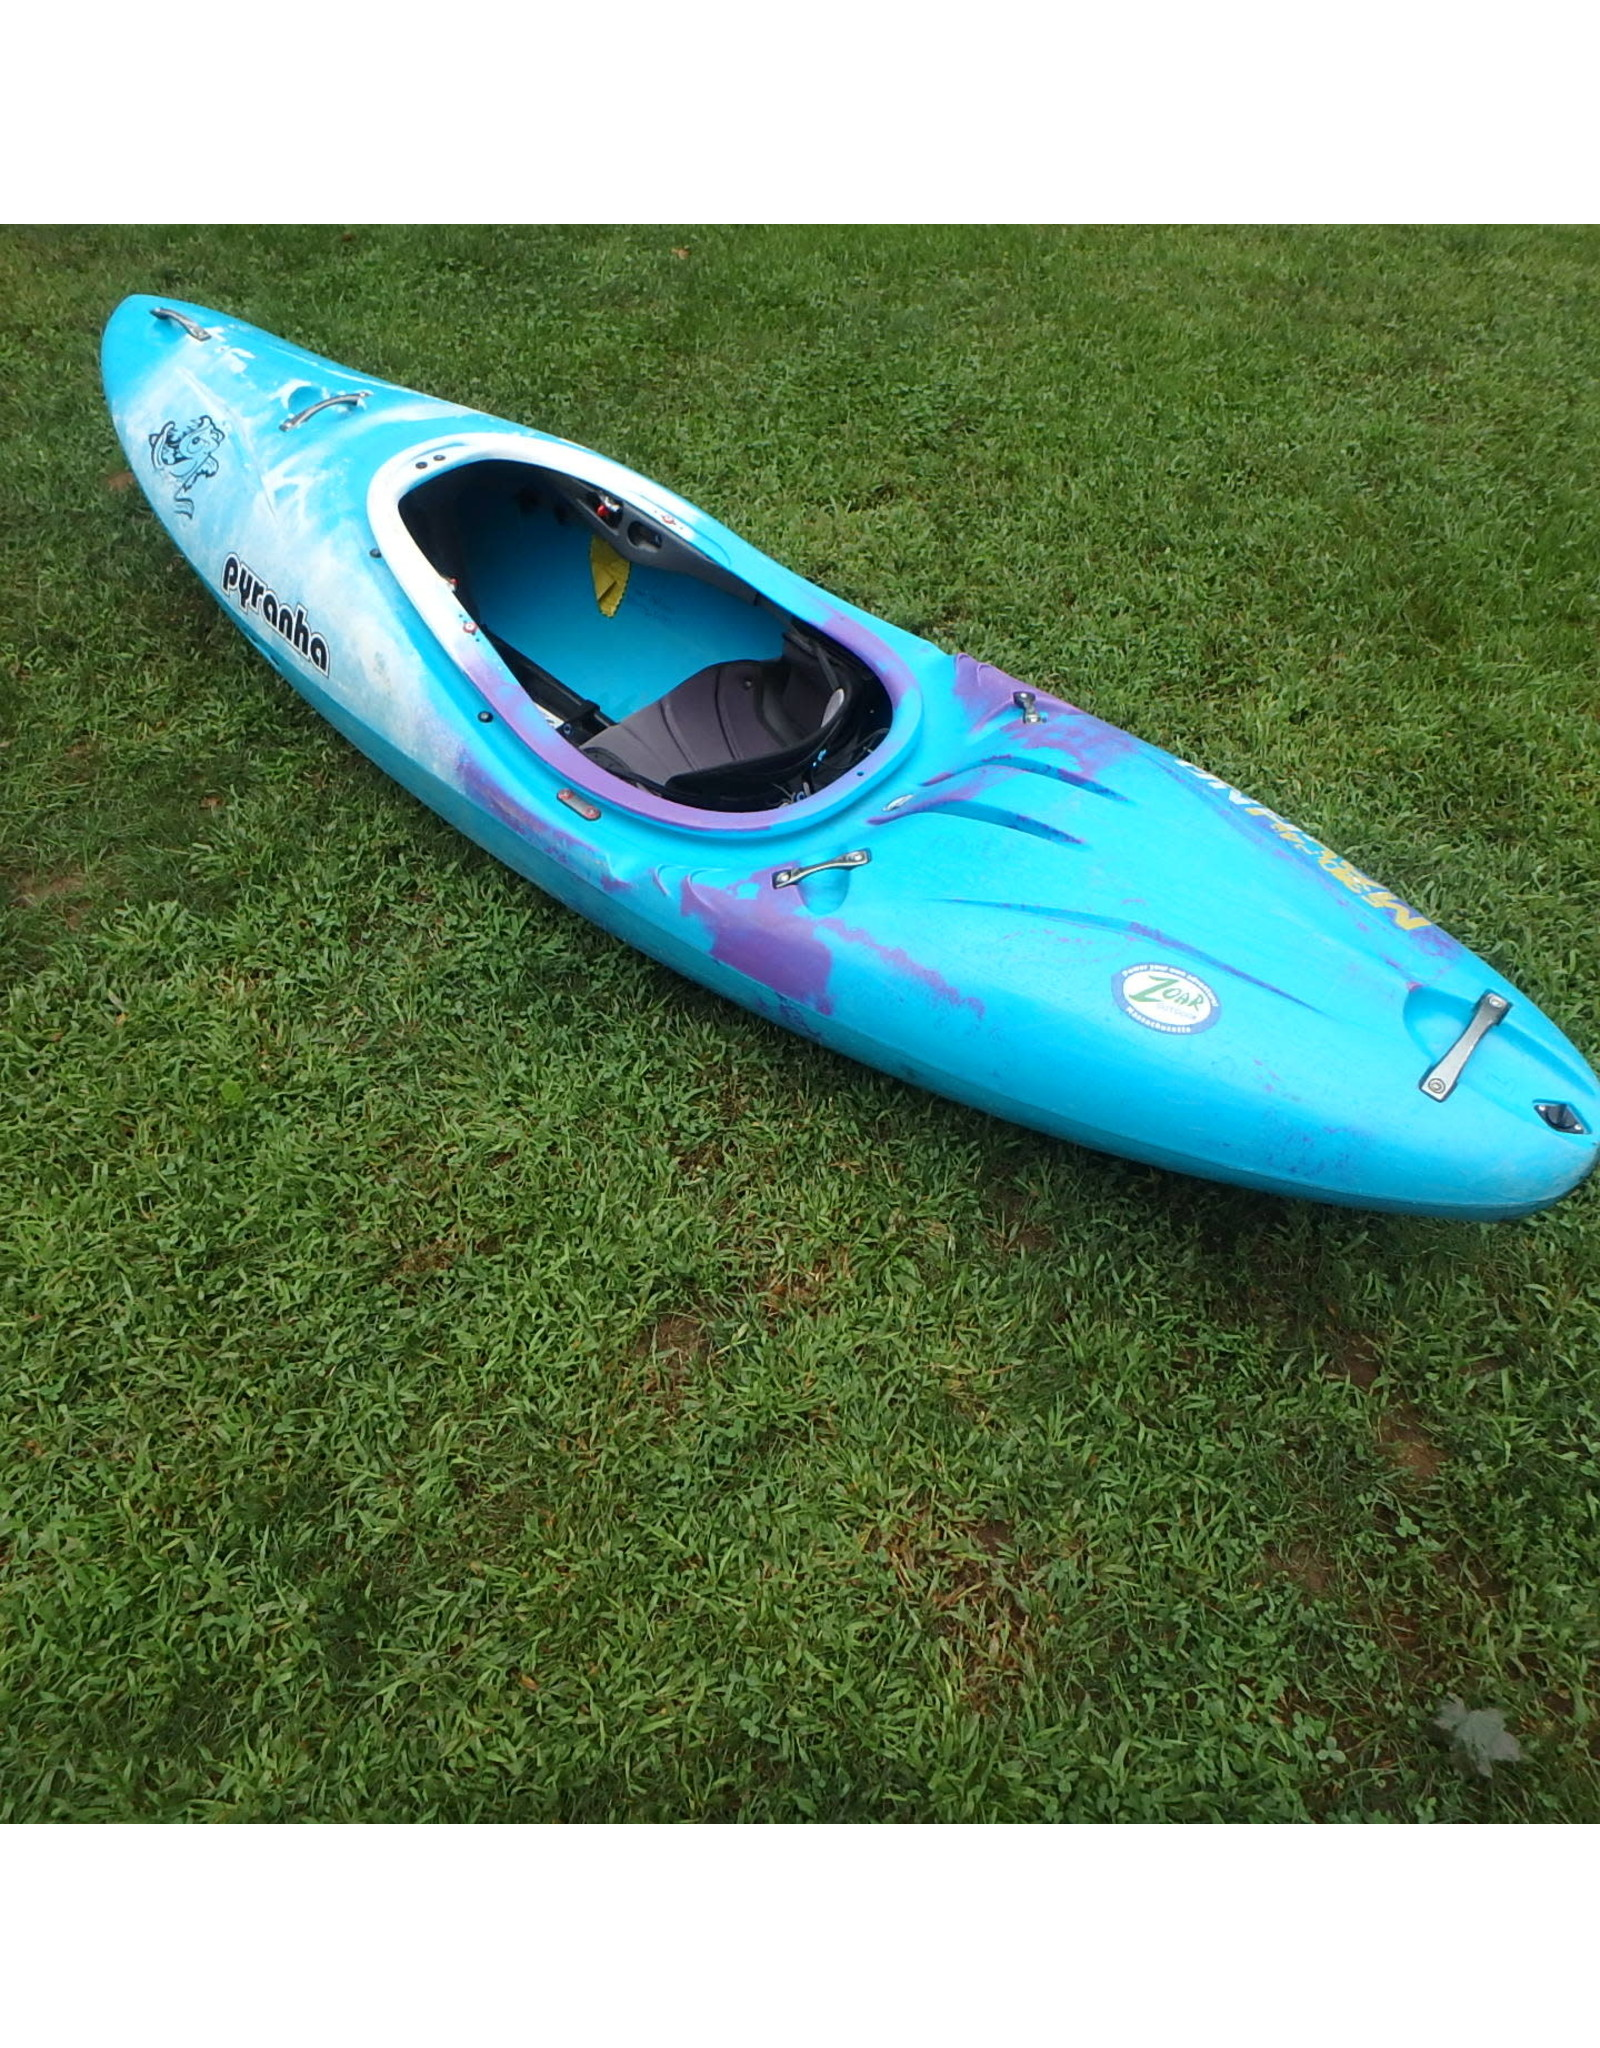 Pyranha Pyranha Machno Kayak - DEMO - For Sale!